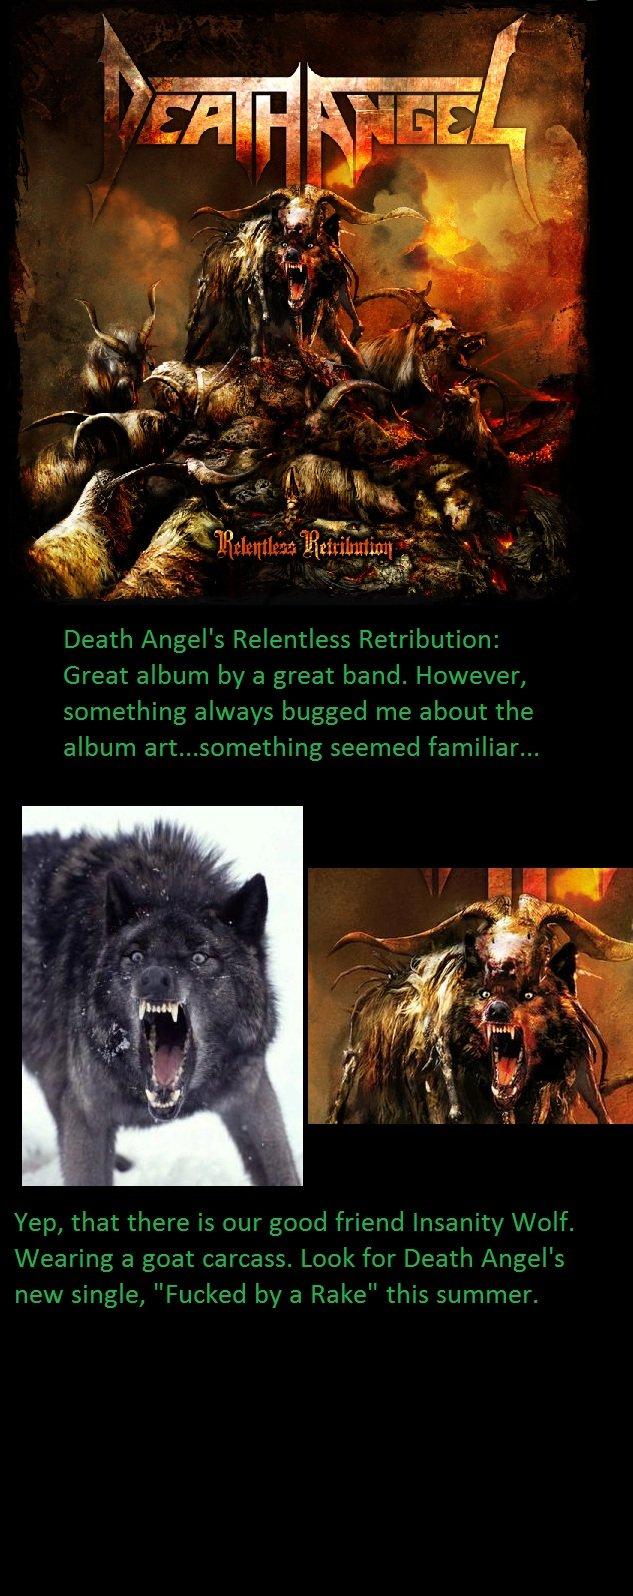 Heavy Metal Meme. Just an observation I noticed. Insanity Wolf death angel meme